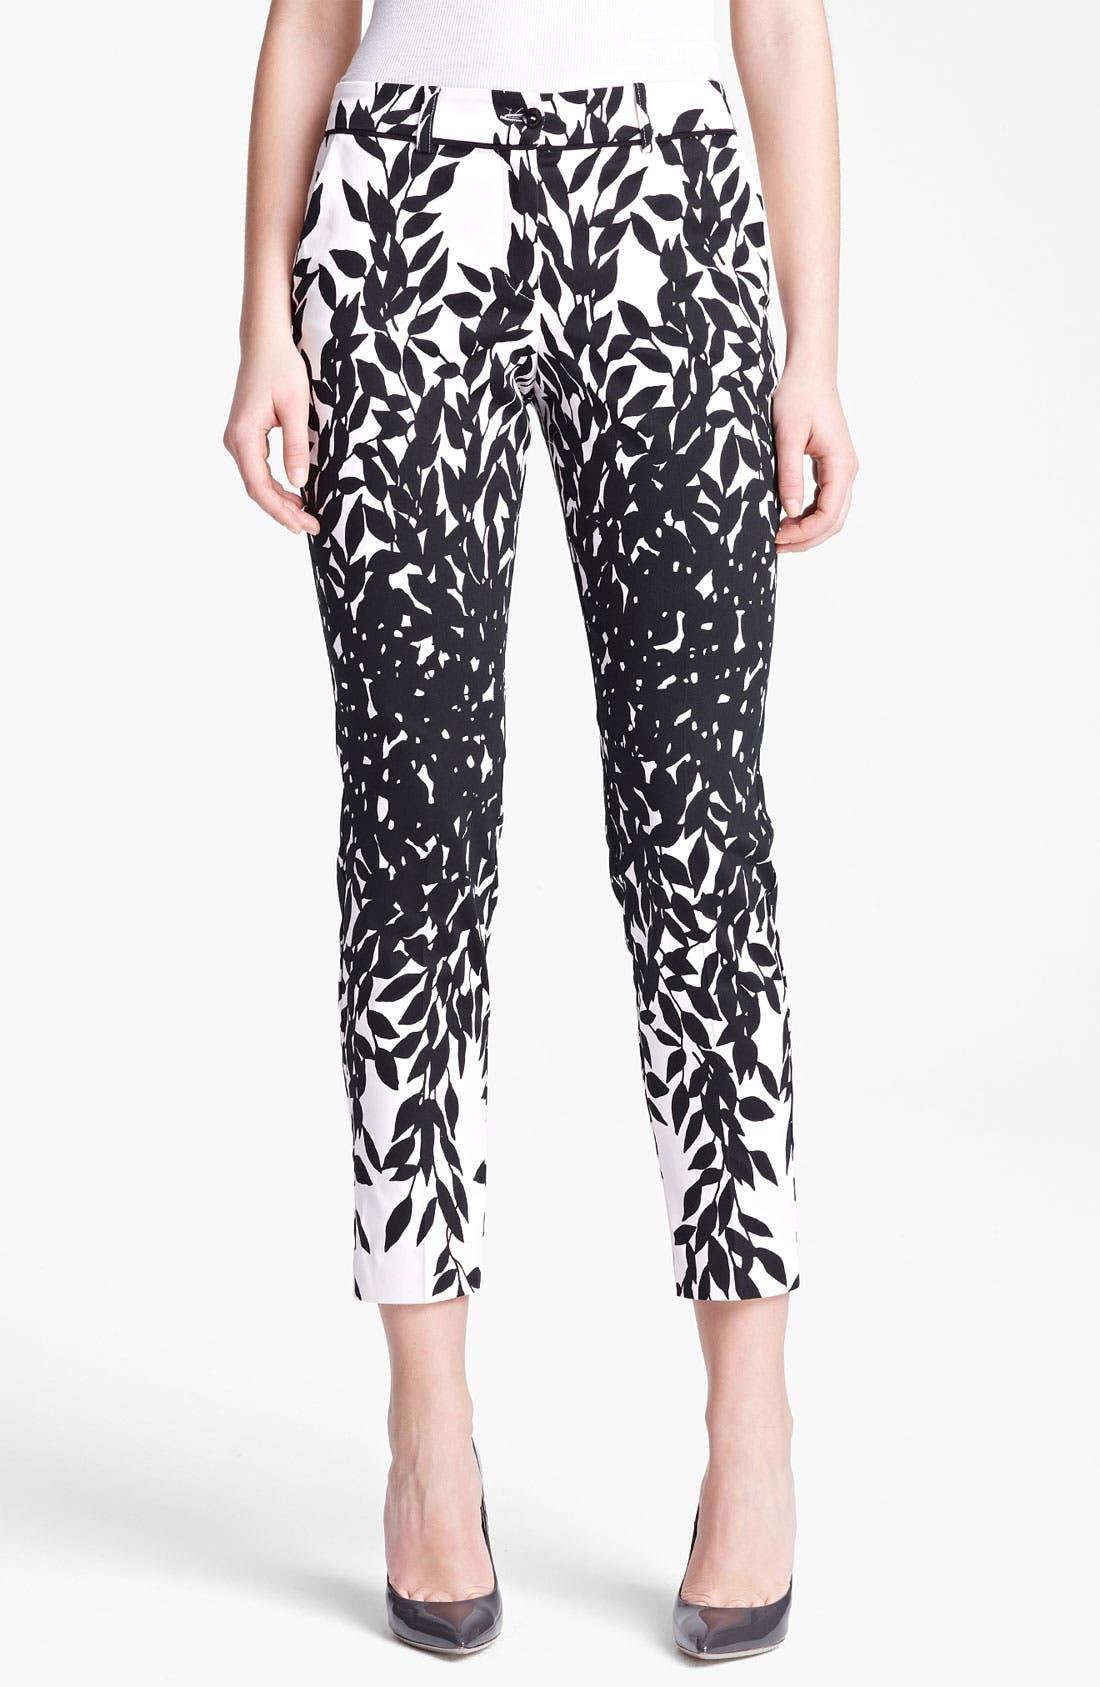 Alternate Image 1 Selected - Blumarine Print Stretch Cotton Capri Pants